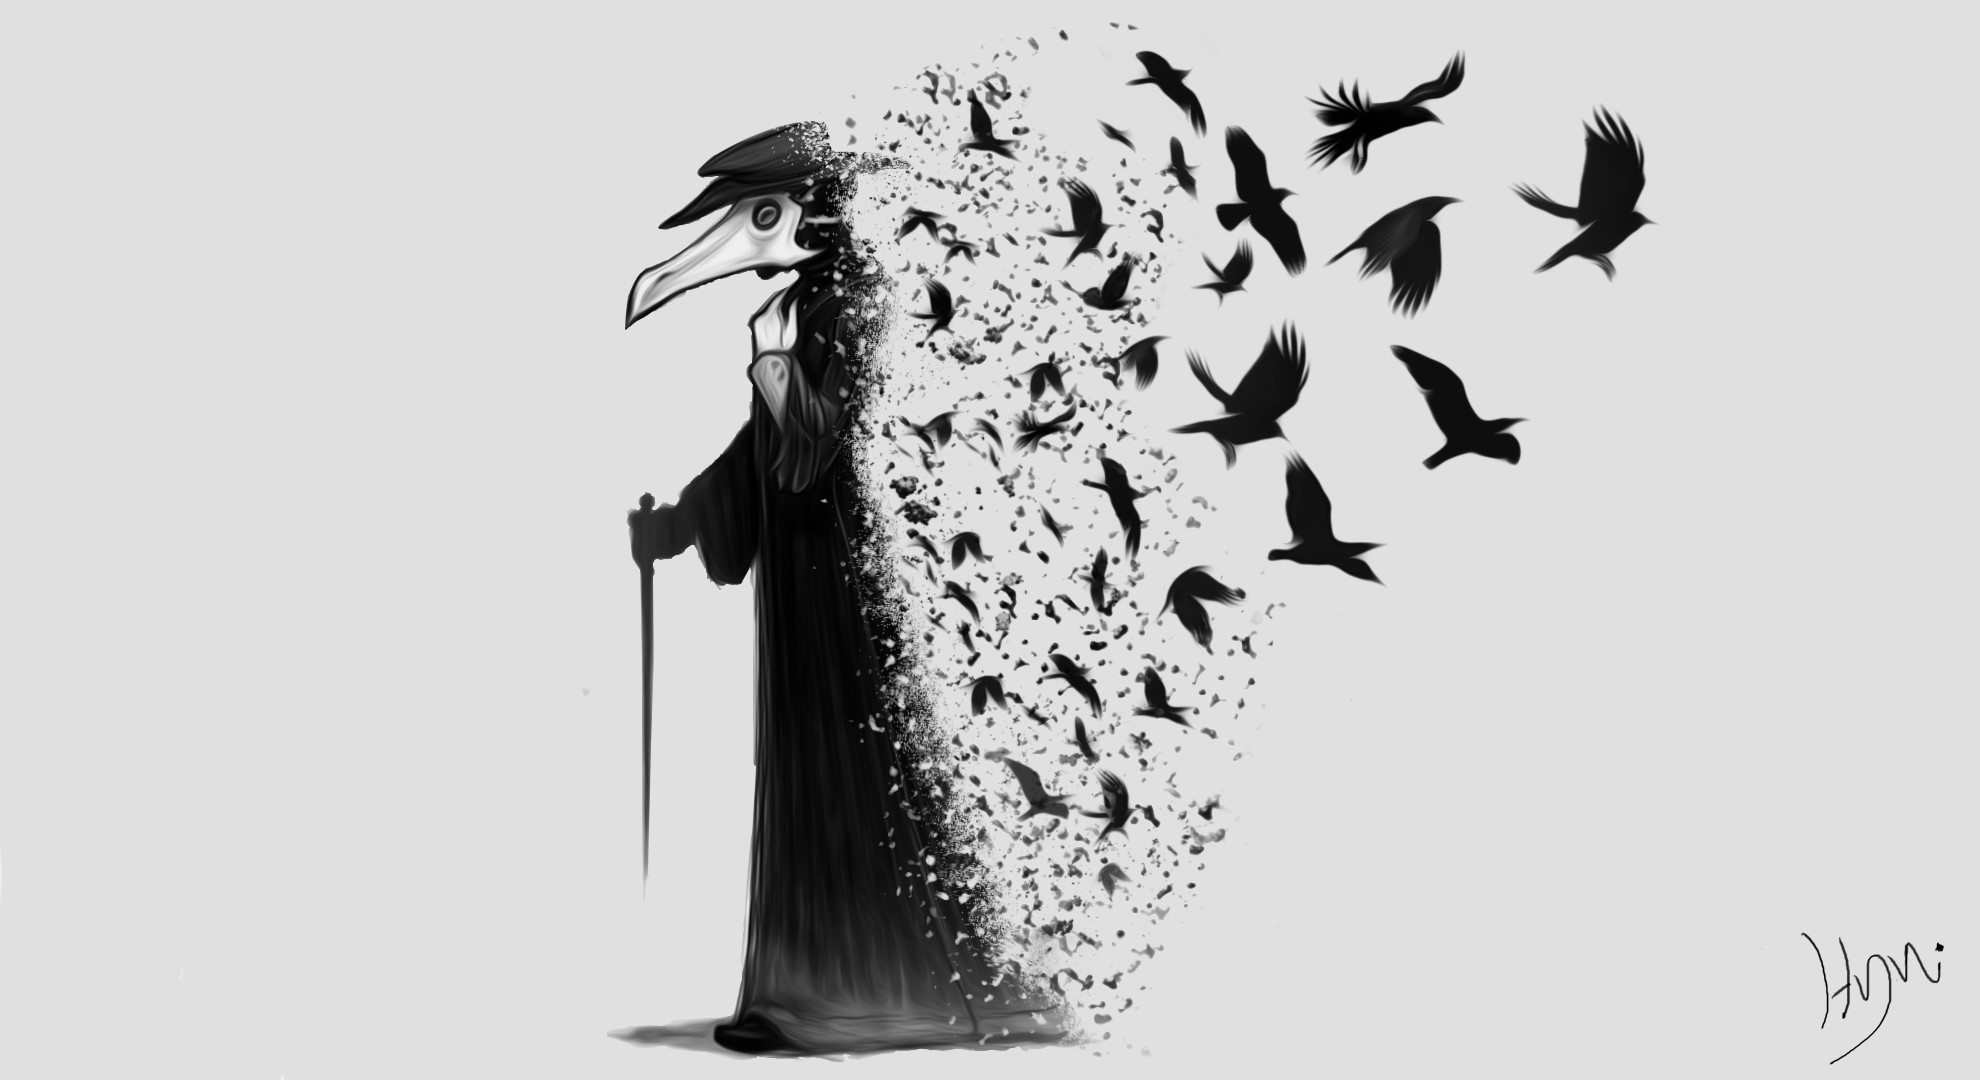 General Plague plague doctors the Darkness dark raven crow black